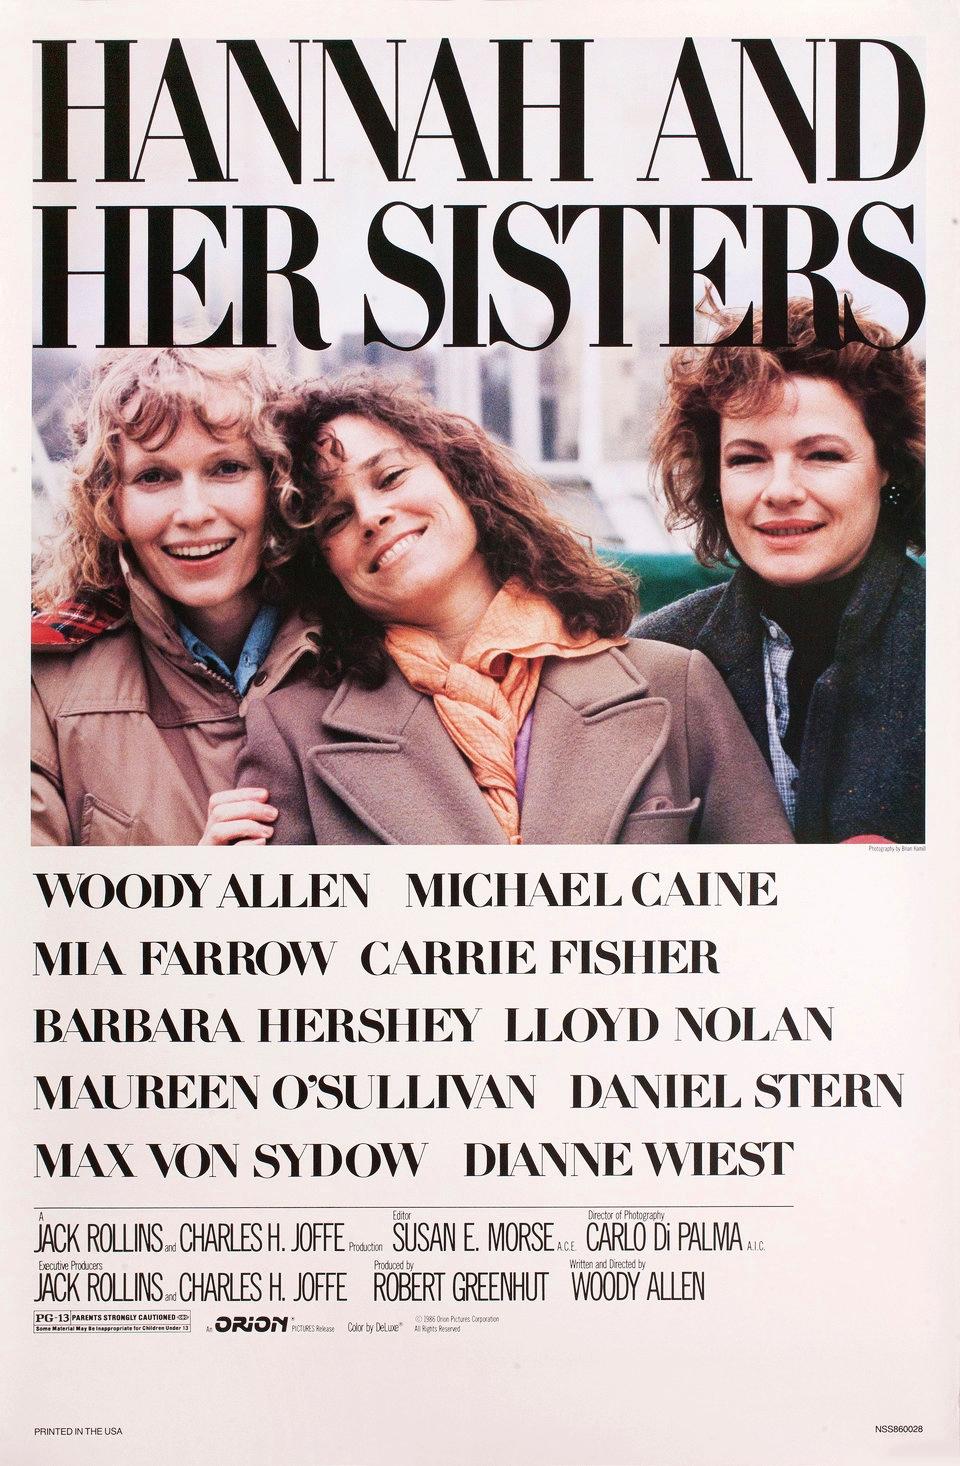 HANA IR JOS SESERYS (1986) / HANNAH AND HER SISTERS